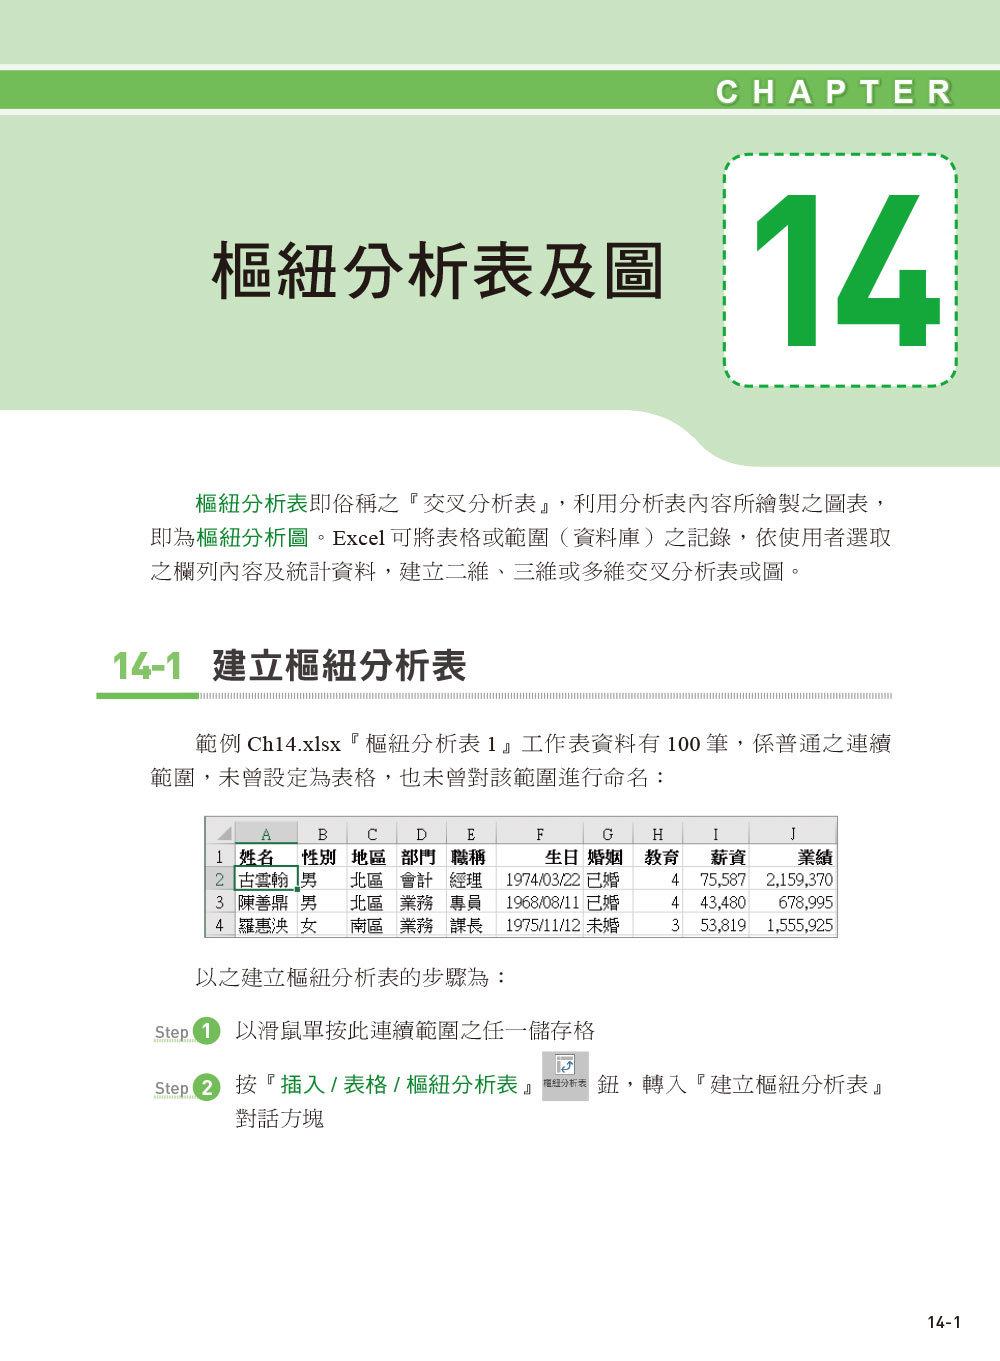 Excel 2019 嚴選教材!核心觀念×範例應用×操作技巧 (適用Excel 2019/2016/2013)-preview-1